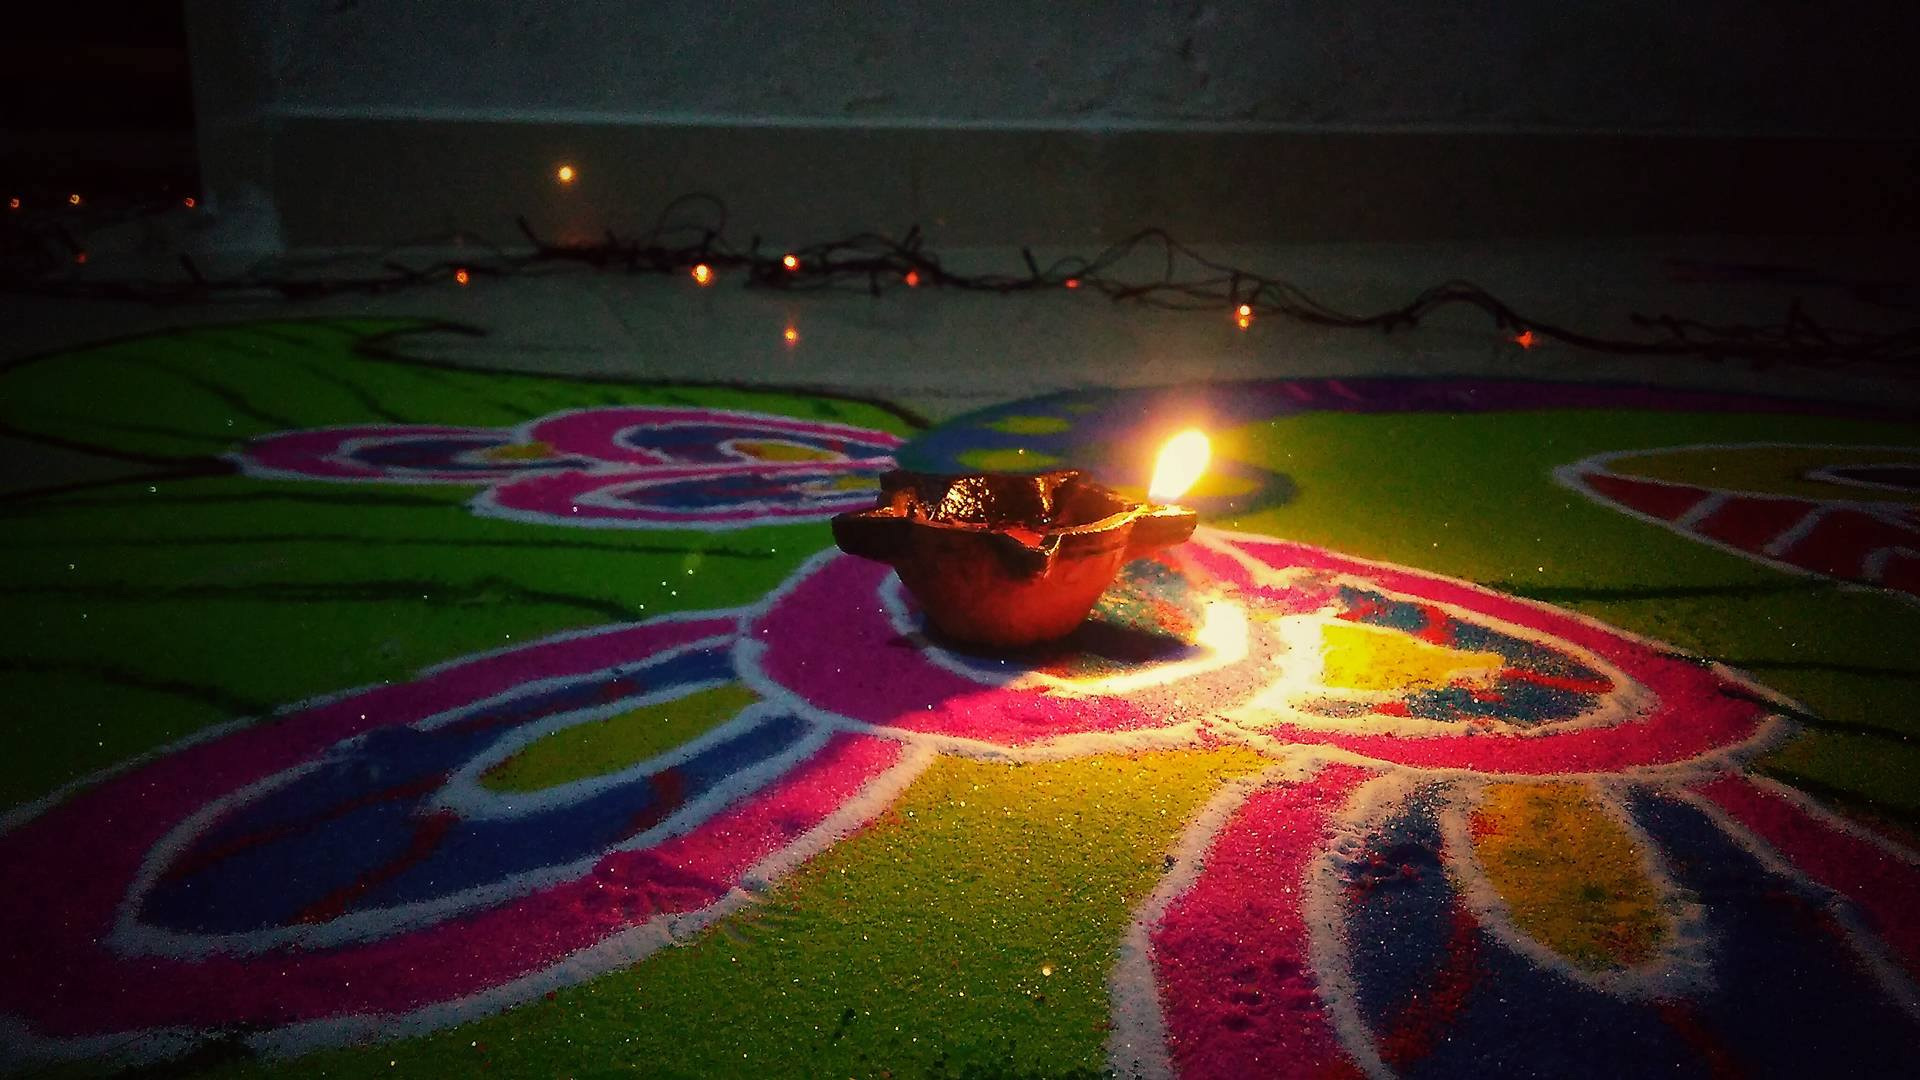 The burning candle during the Diwali. Photo: Navjyot Vyas, Gujarat, 20116.